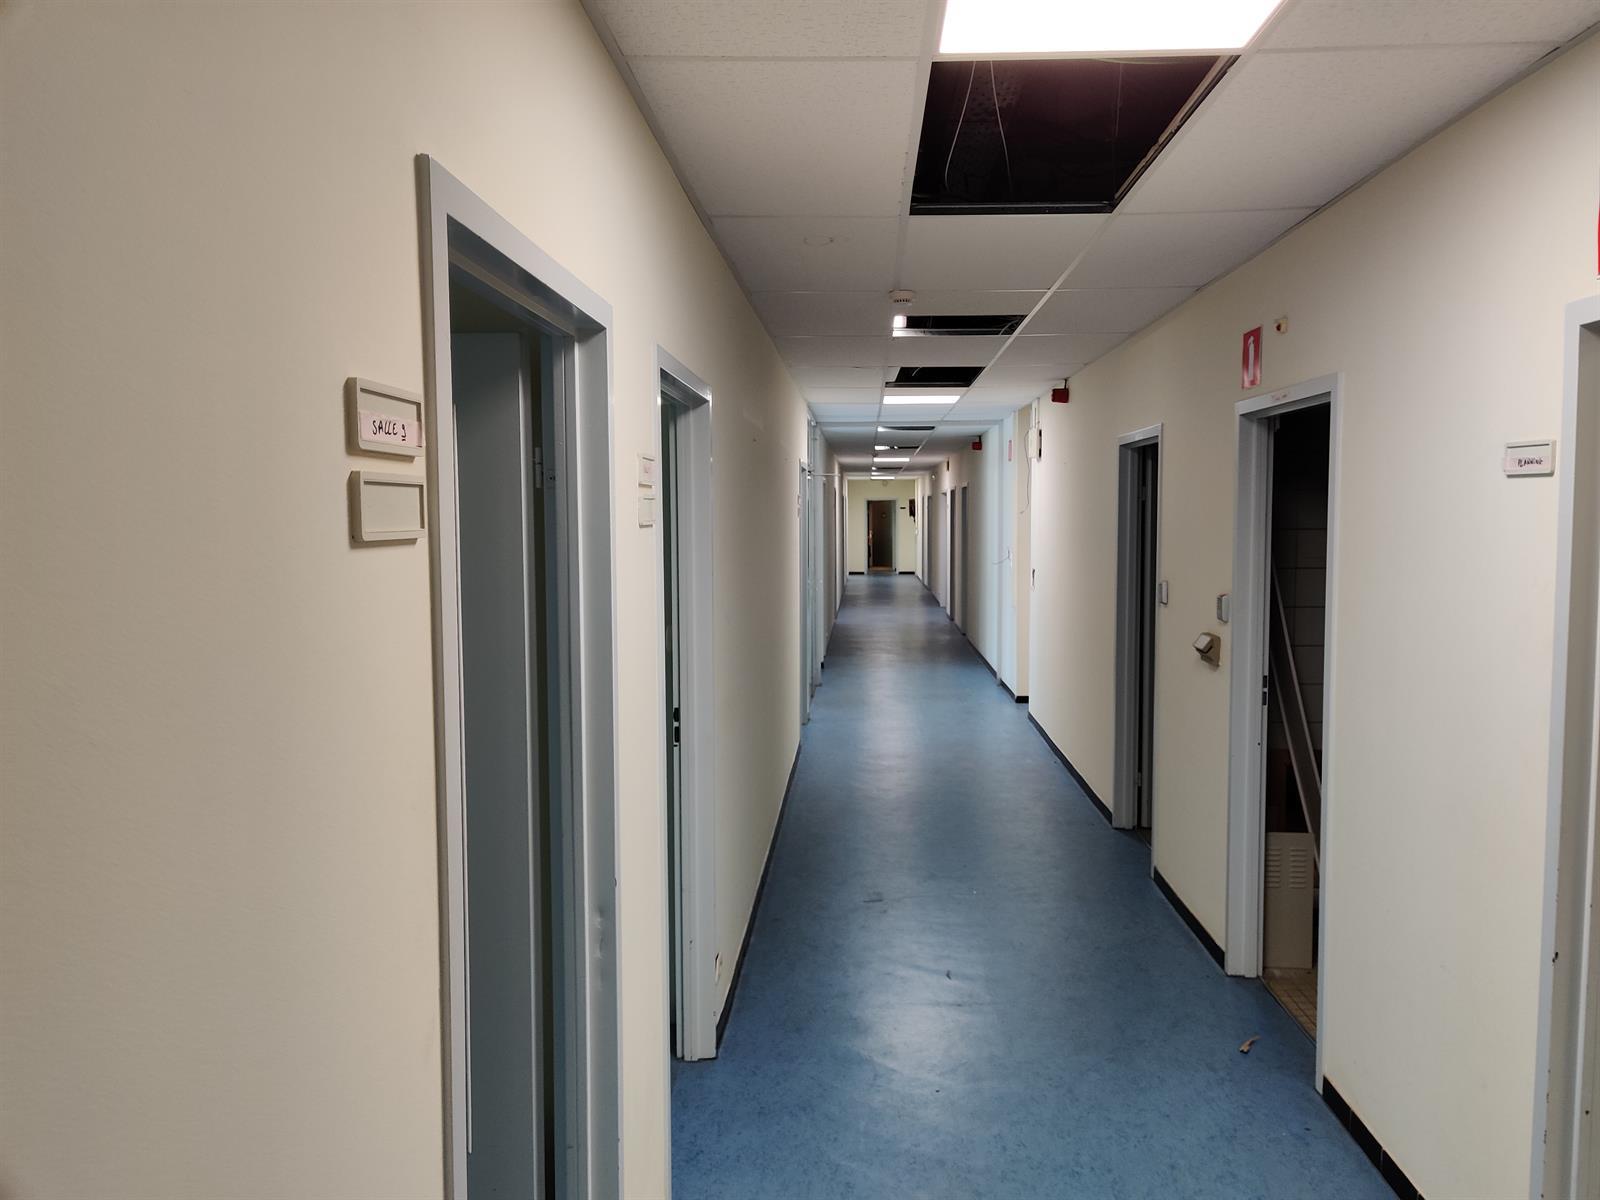 gebouw voor gemengd gebruik te huur I173 - Quatrieme Rue , 6040 Charleroi Jumet, België 21